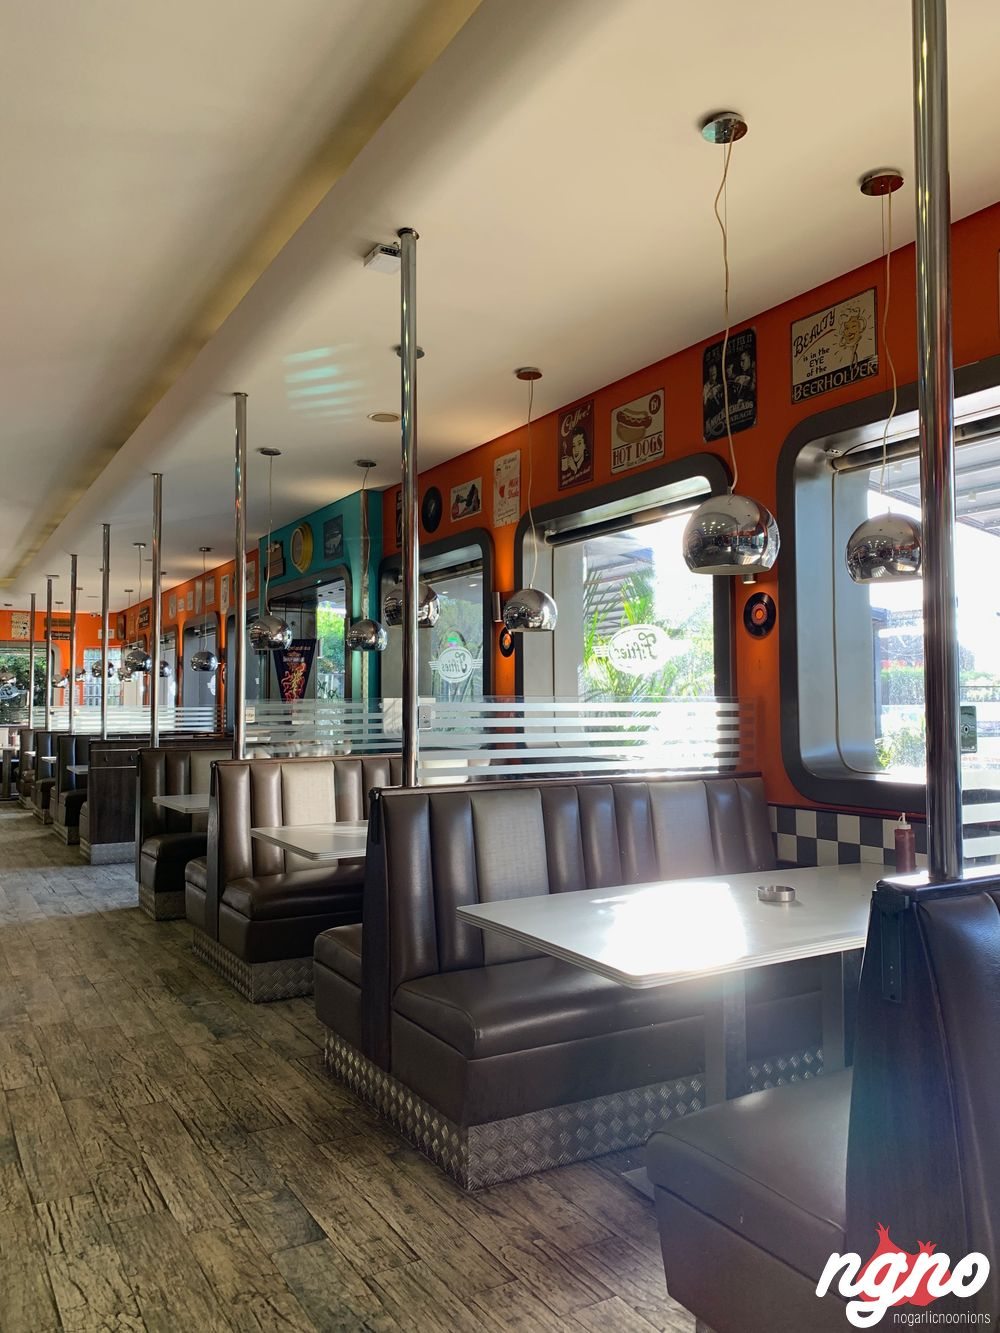 fifties-diner-tripoli-restaurant-lebanon-nogarlicnoonions-822018-11-04-05-20-52